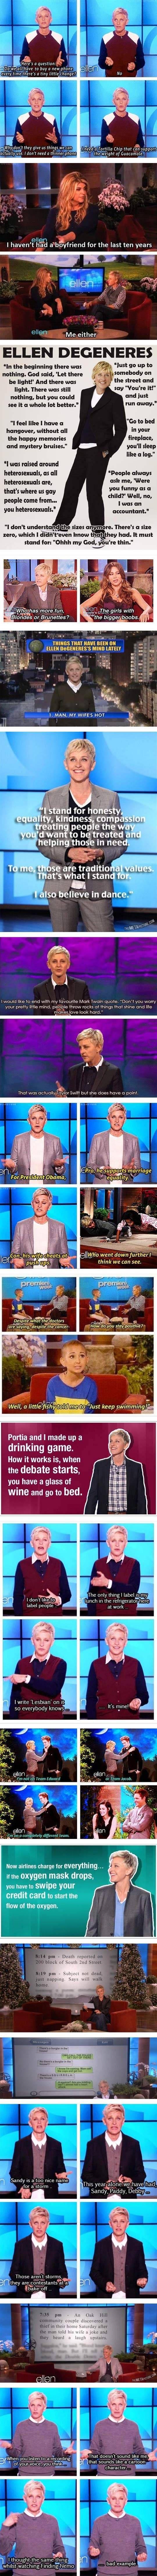 Oh Ellen. Gotta love her!